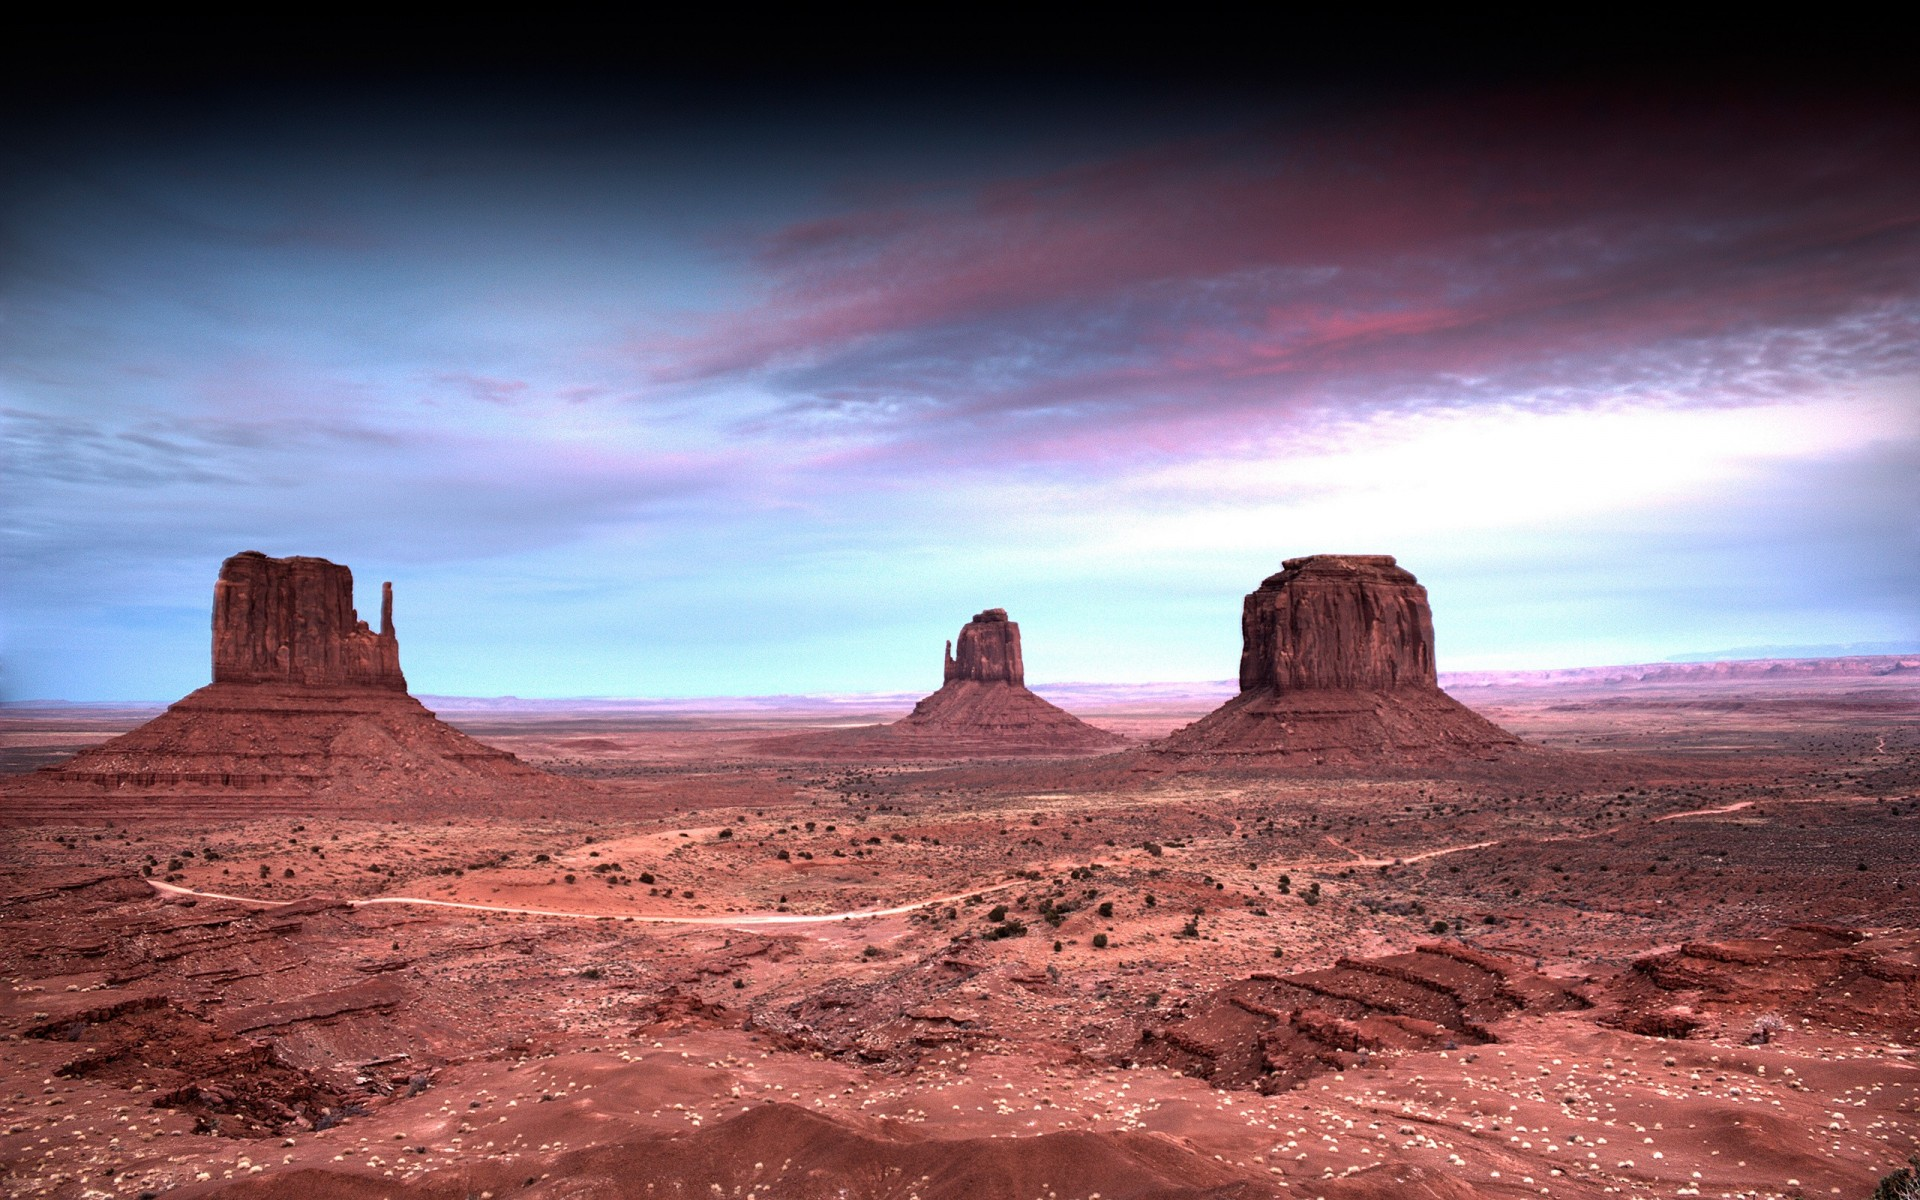 Arizona Landscape Wallpaper - WallpaperSafari